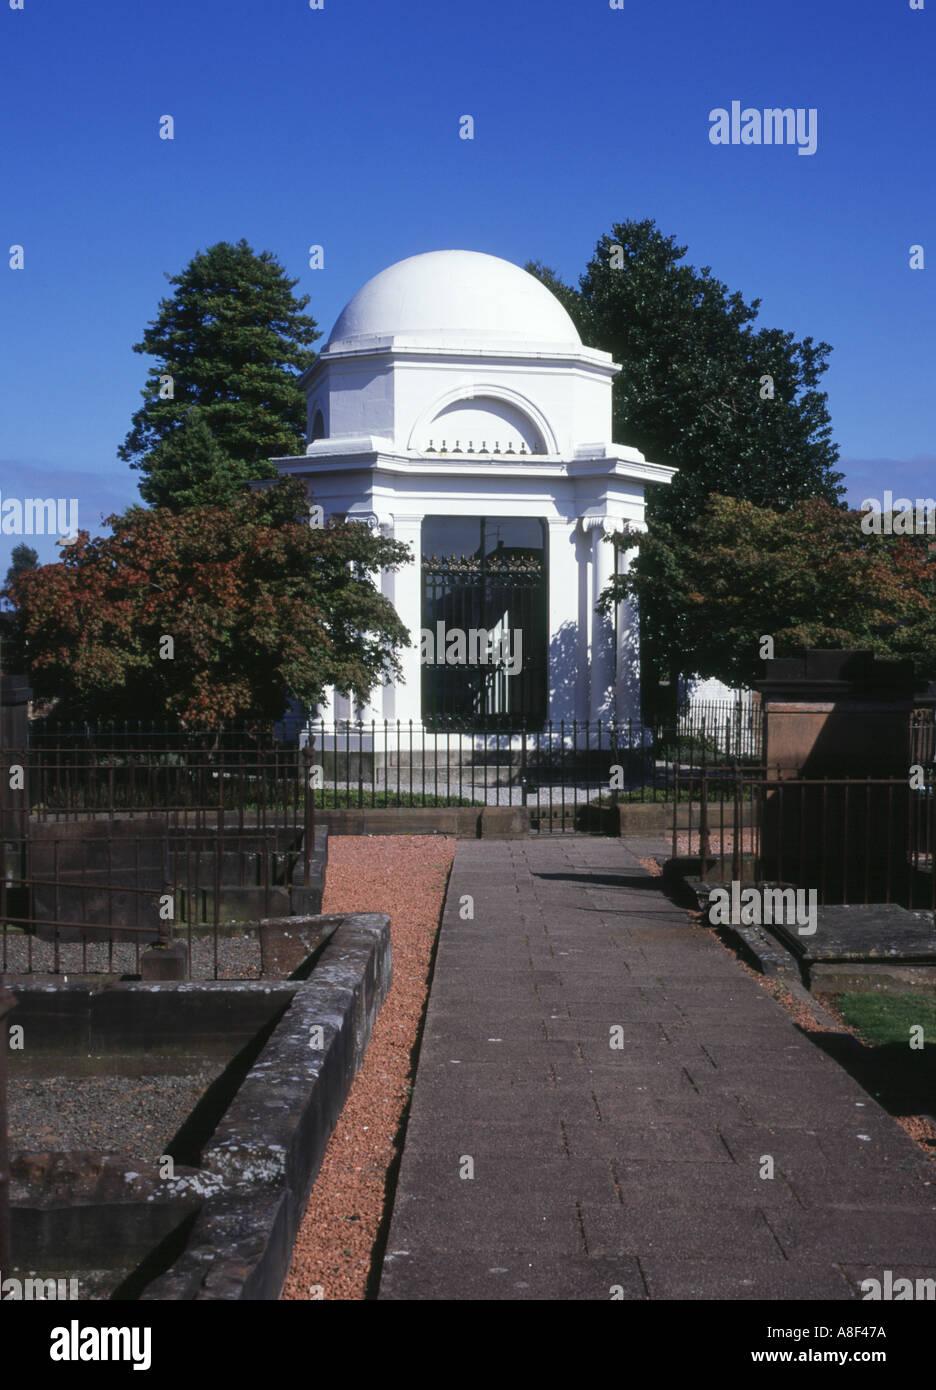 Dh St Michaels y South Church DUMFRIES GALLOWAY Robert Burns poetas mausoleo neoclásico cementerio cementerio Foto de stock